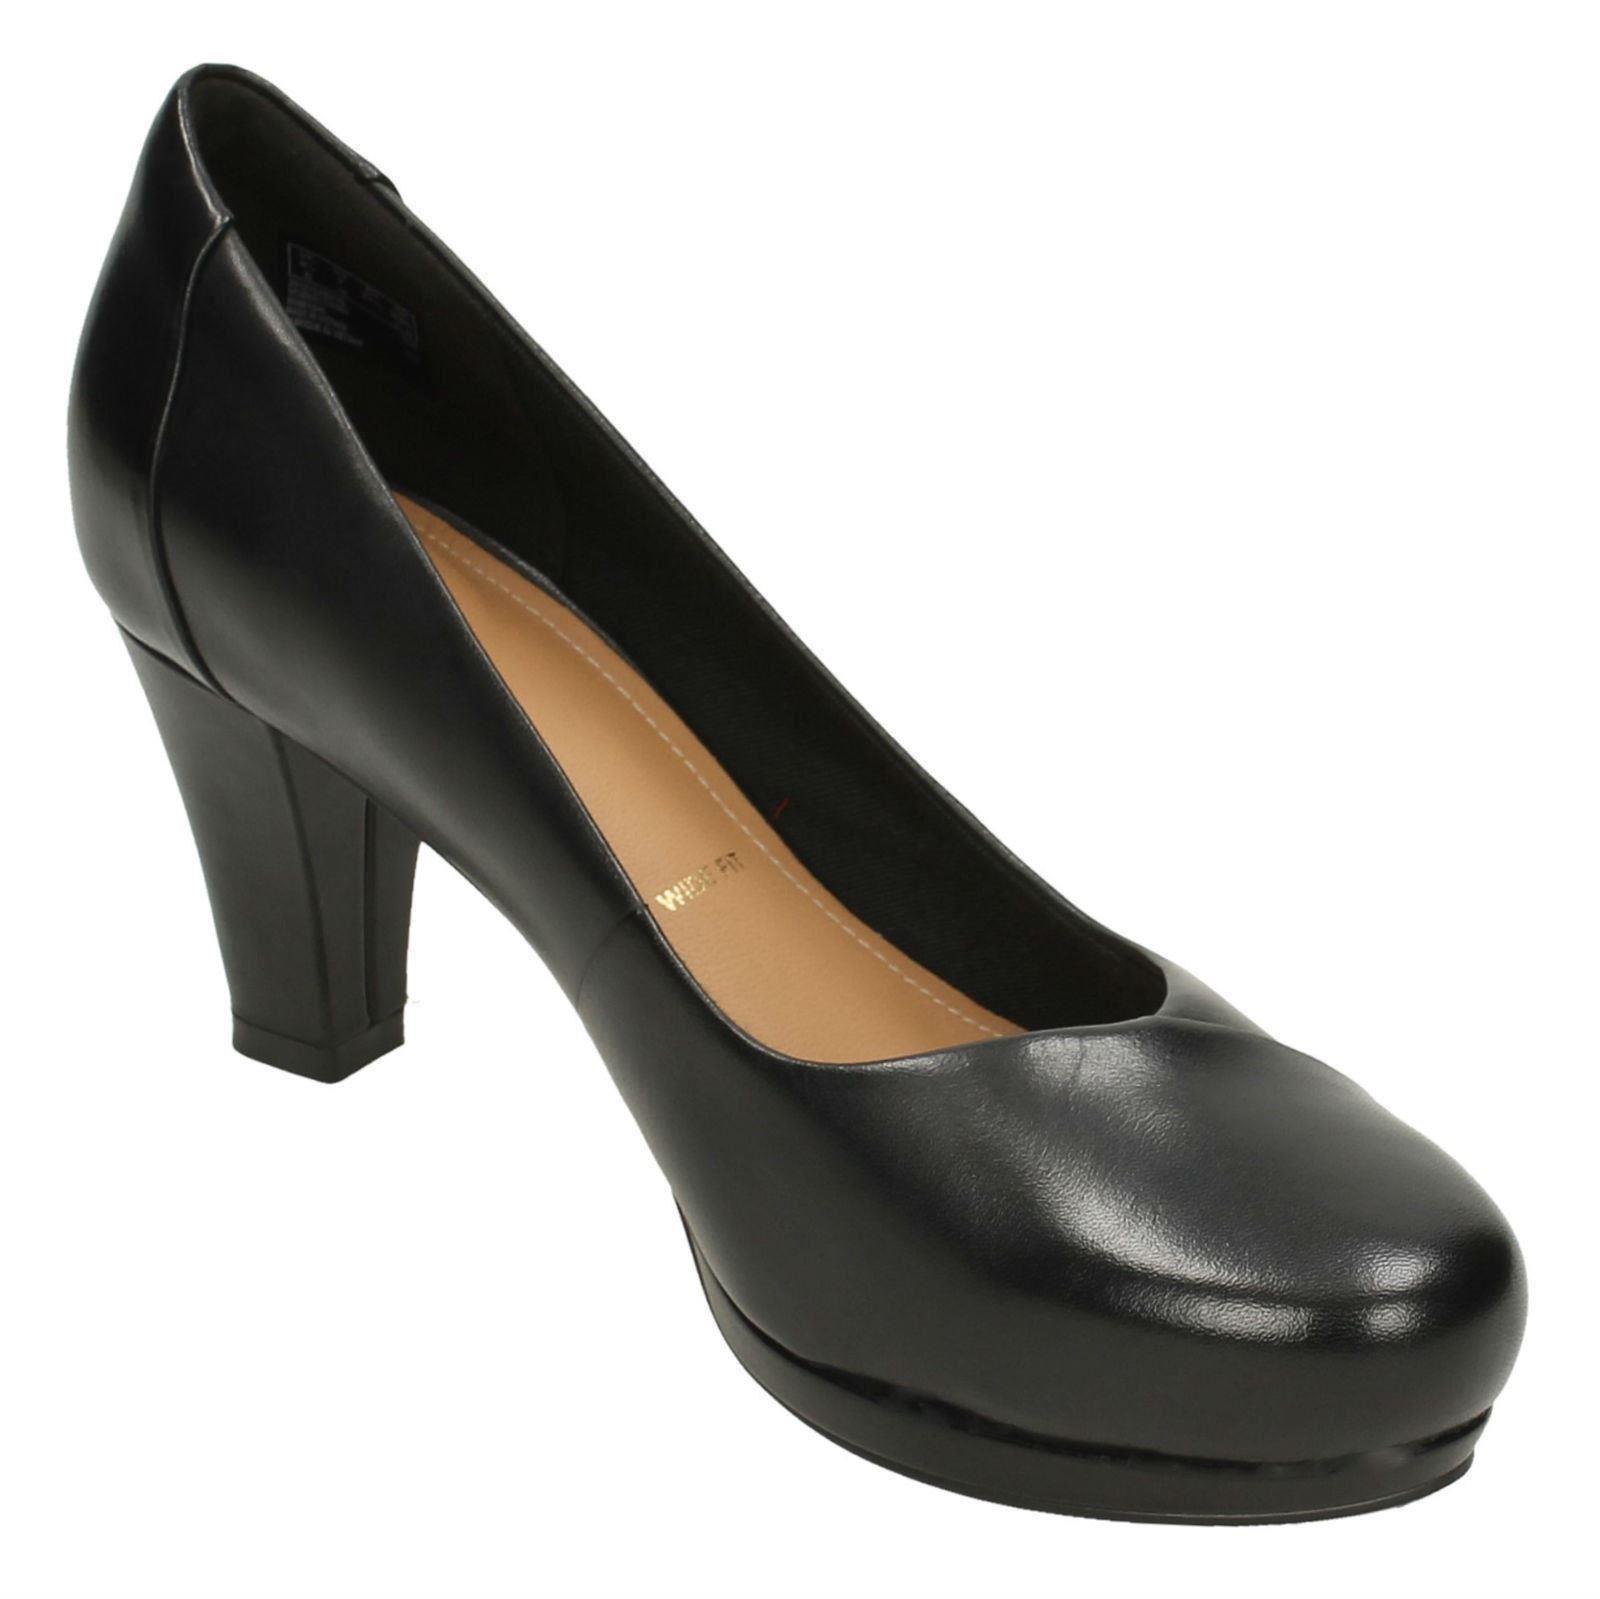 Clarks Chorus Shoes